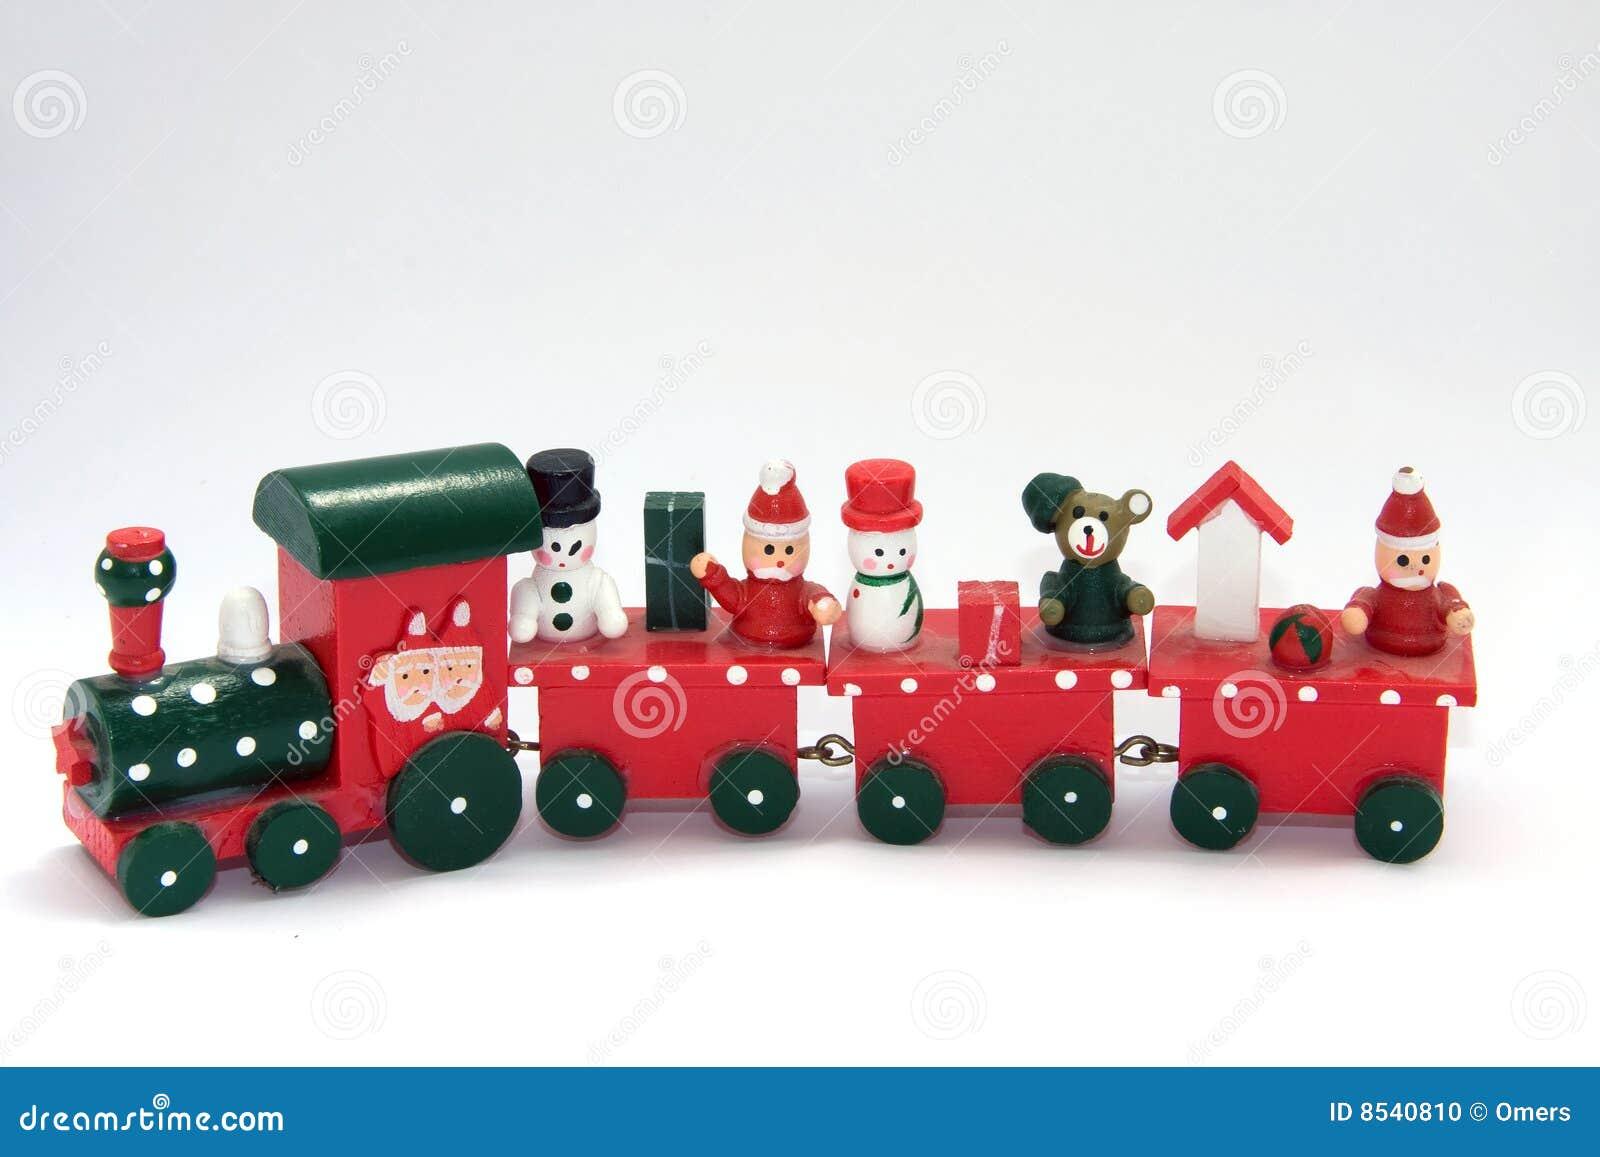 toy train stock photo image 8540810. Black Bedroom Furniture Sets. Home Design Ideas